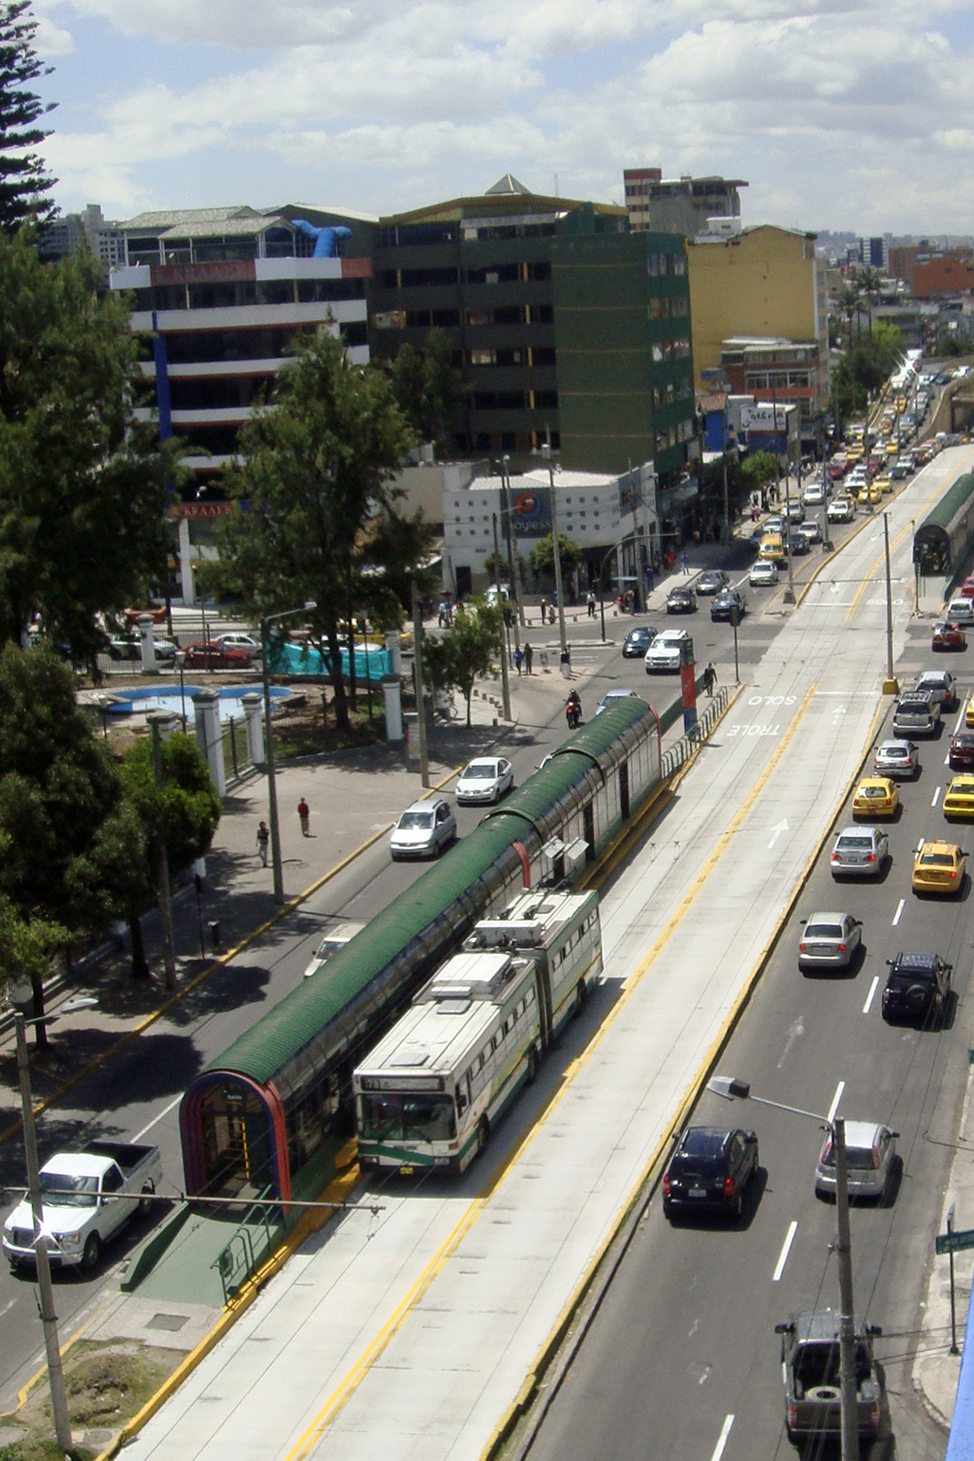 http://upload.wikimedia.org/wikipedia/commons/b/b0/Quito_Trole_08_2011_3335.jpg